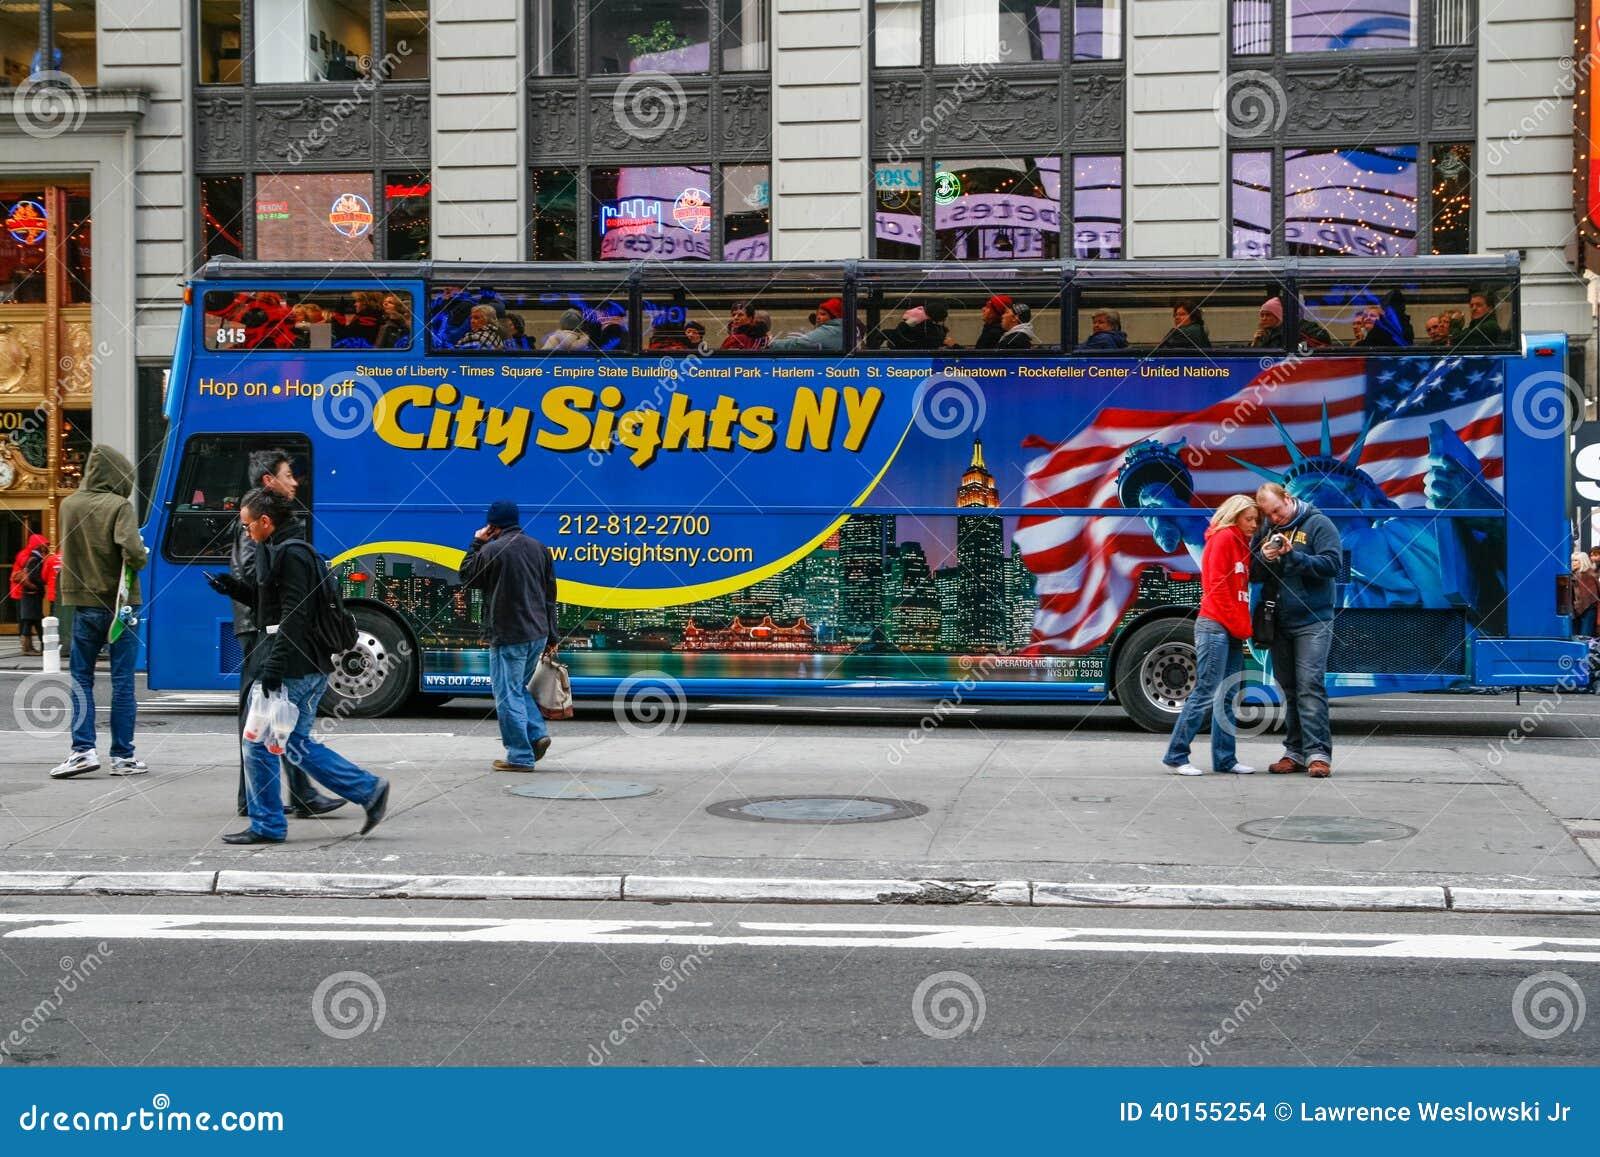 New York City Architecture Bus Tour